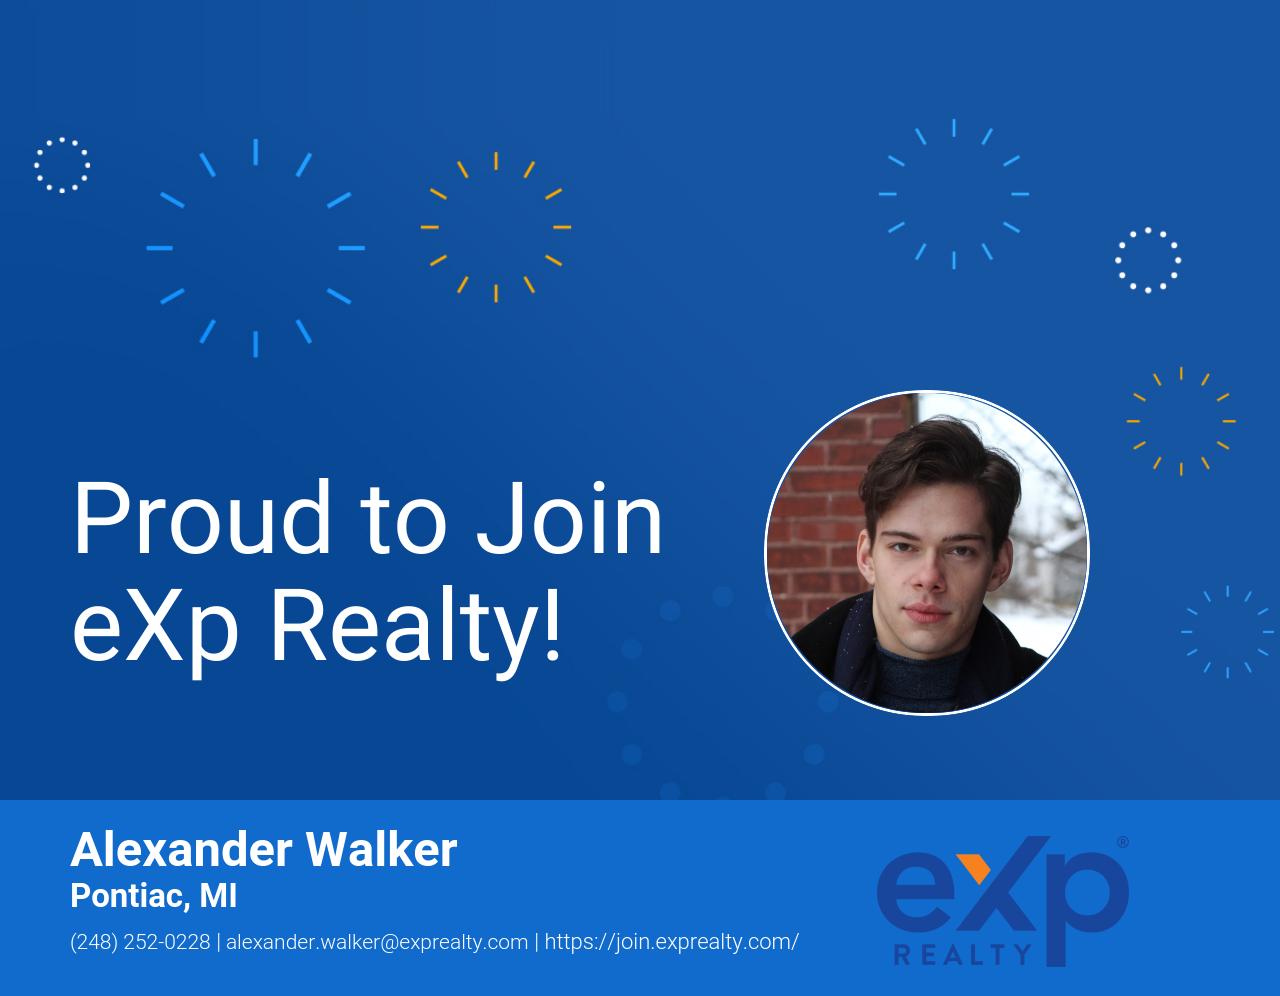 Alexander Walker Joined eXp Realty!